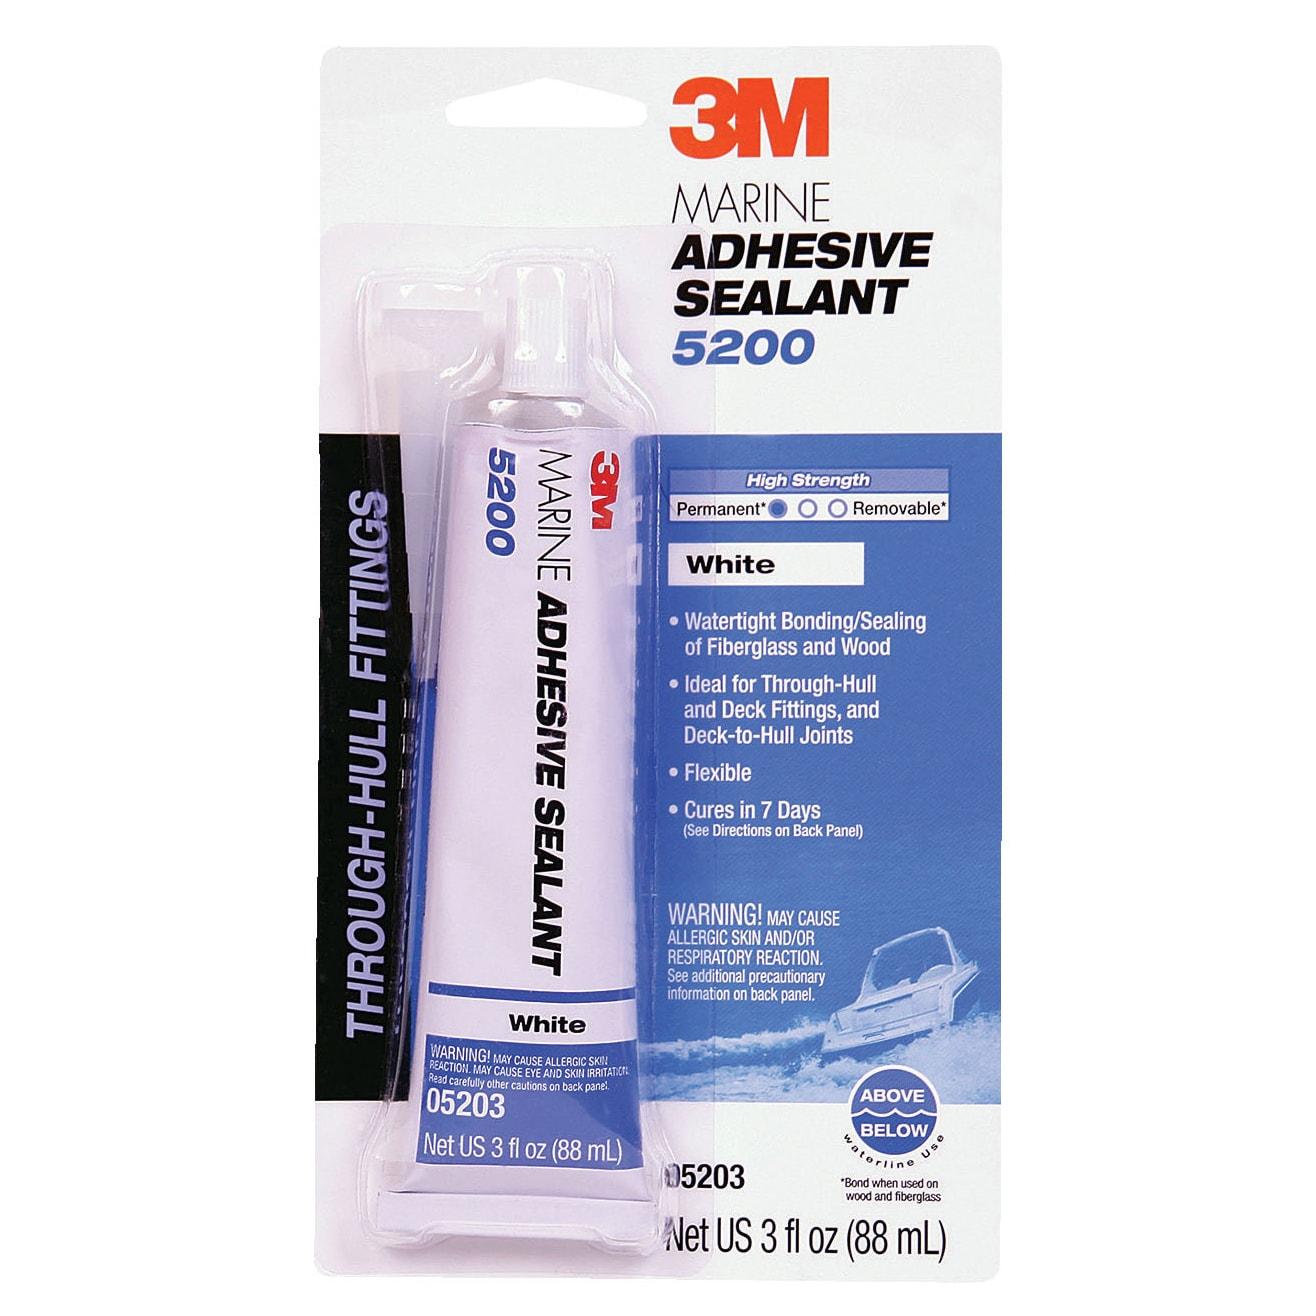 3M 05206 1 Oz White Marine Adhesive Sealant (Specialty Ca...